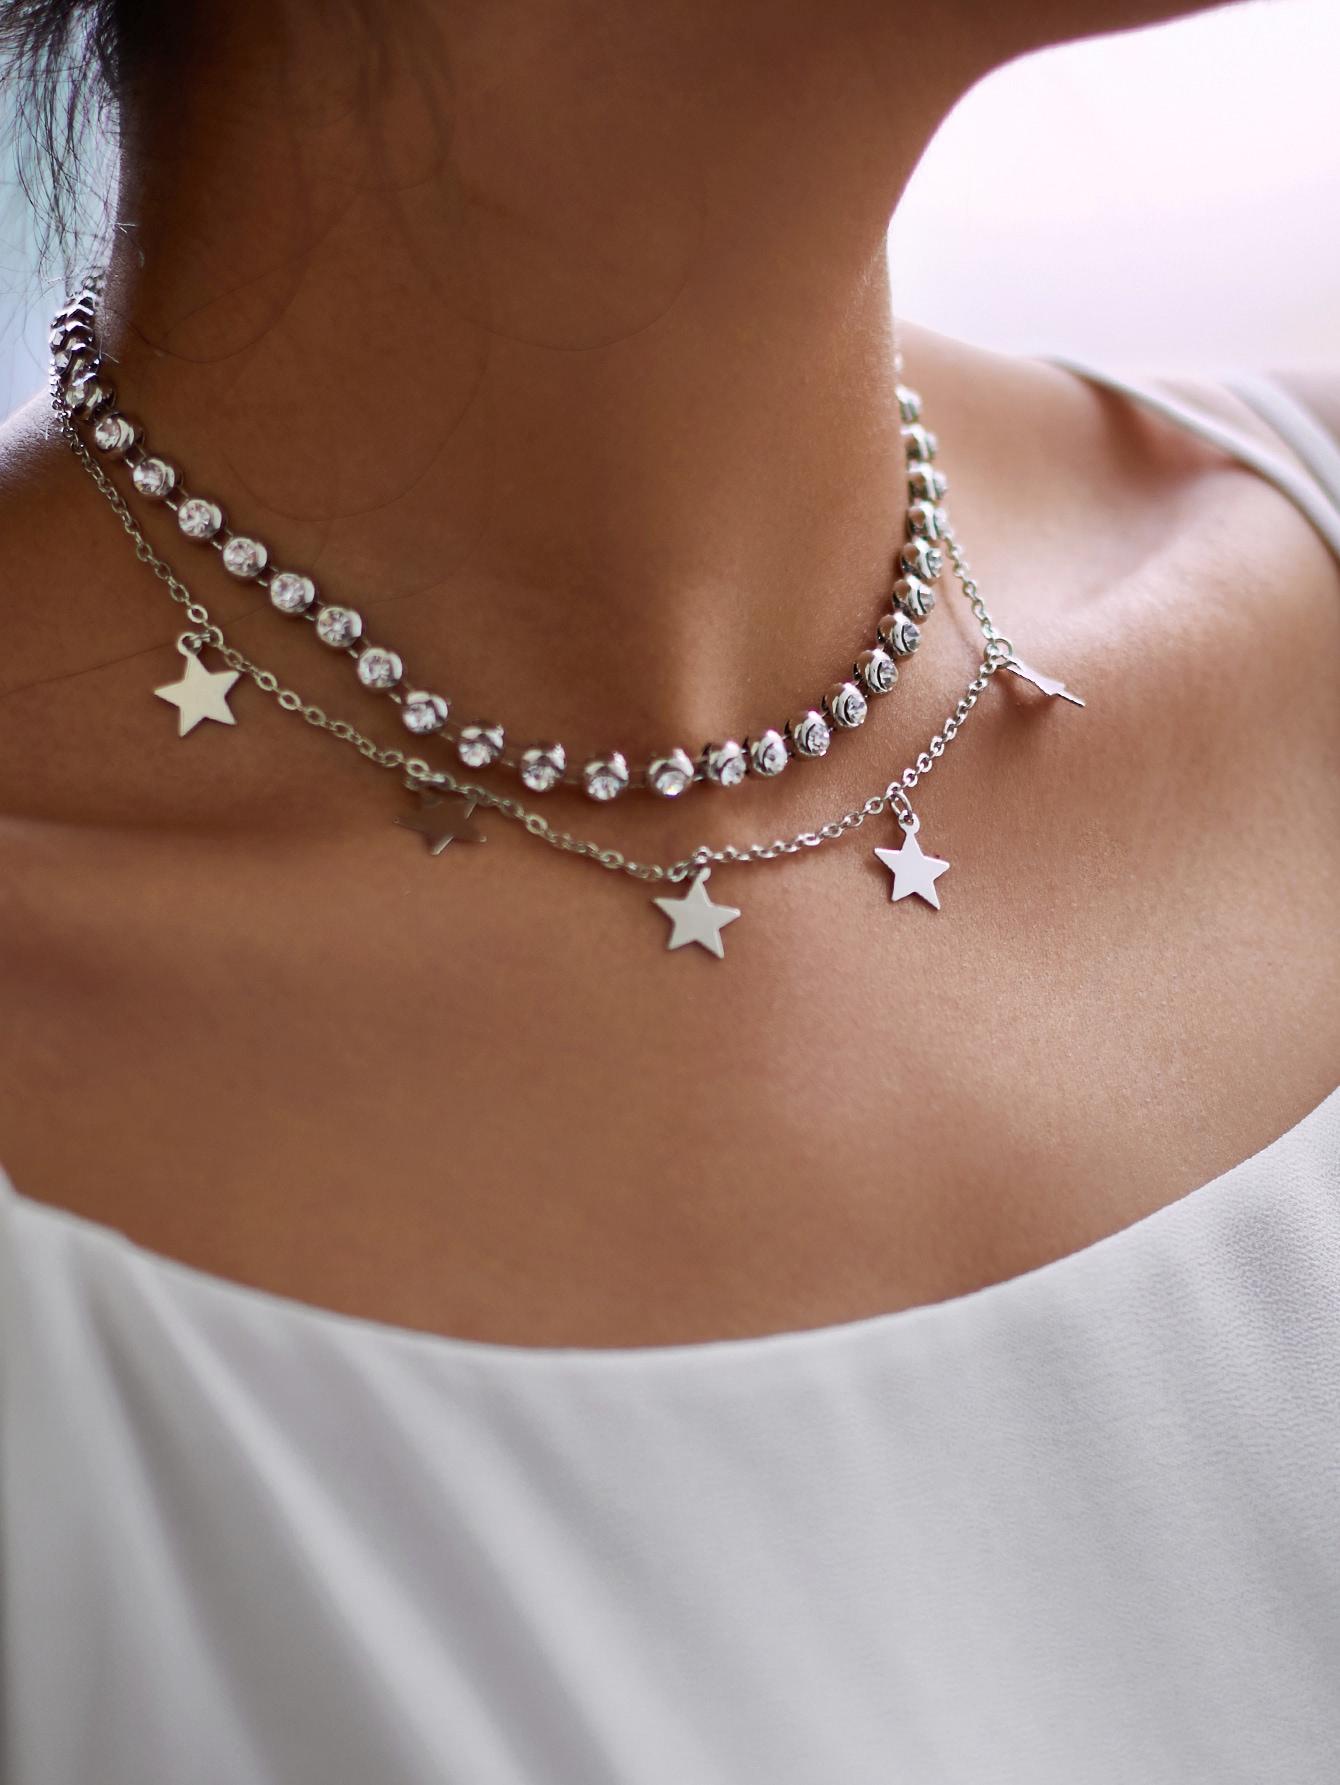 Star & Rhinestone Layered Chain Necklace